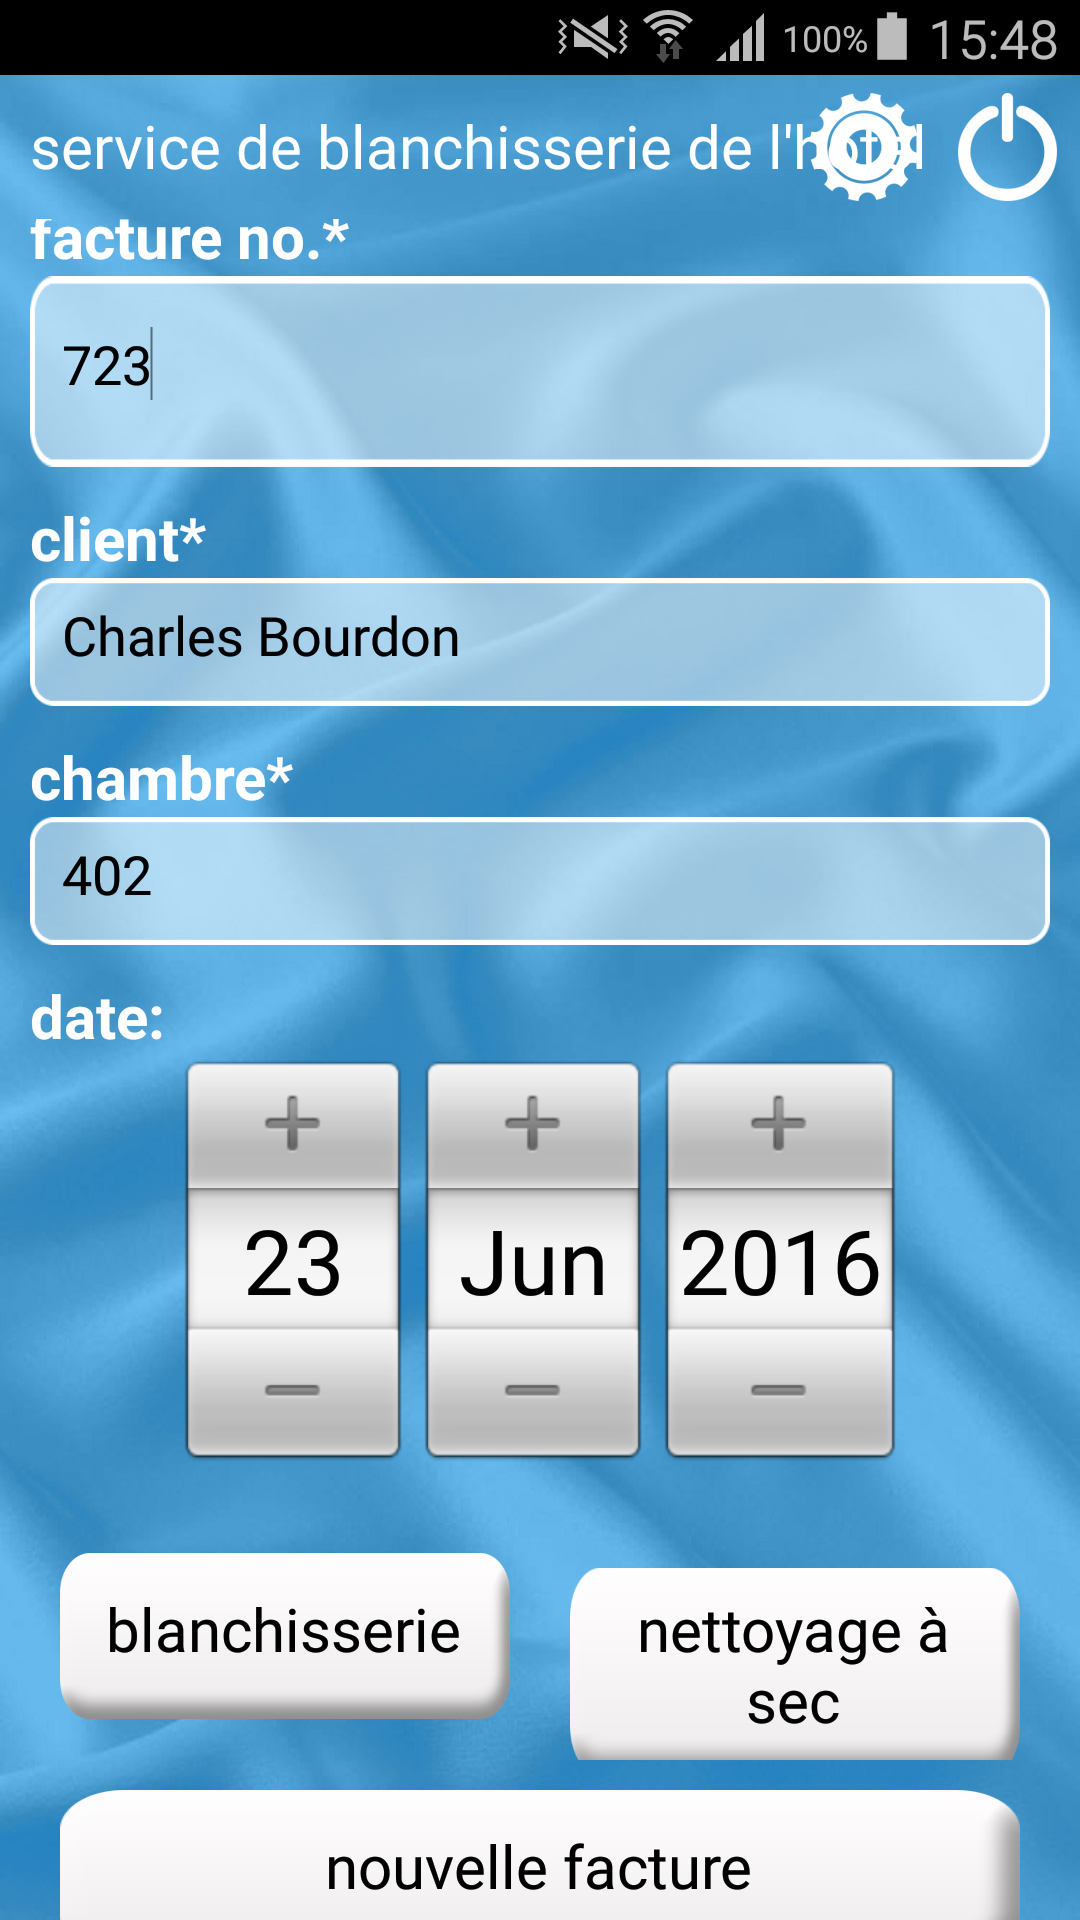 ginstr_app_hotelLaundryService_FR_3